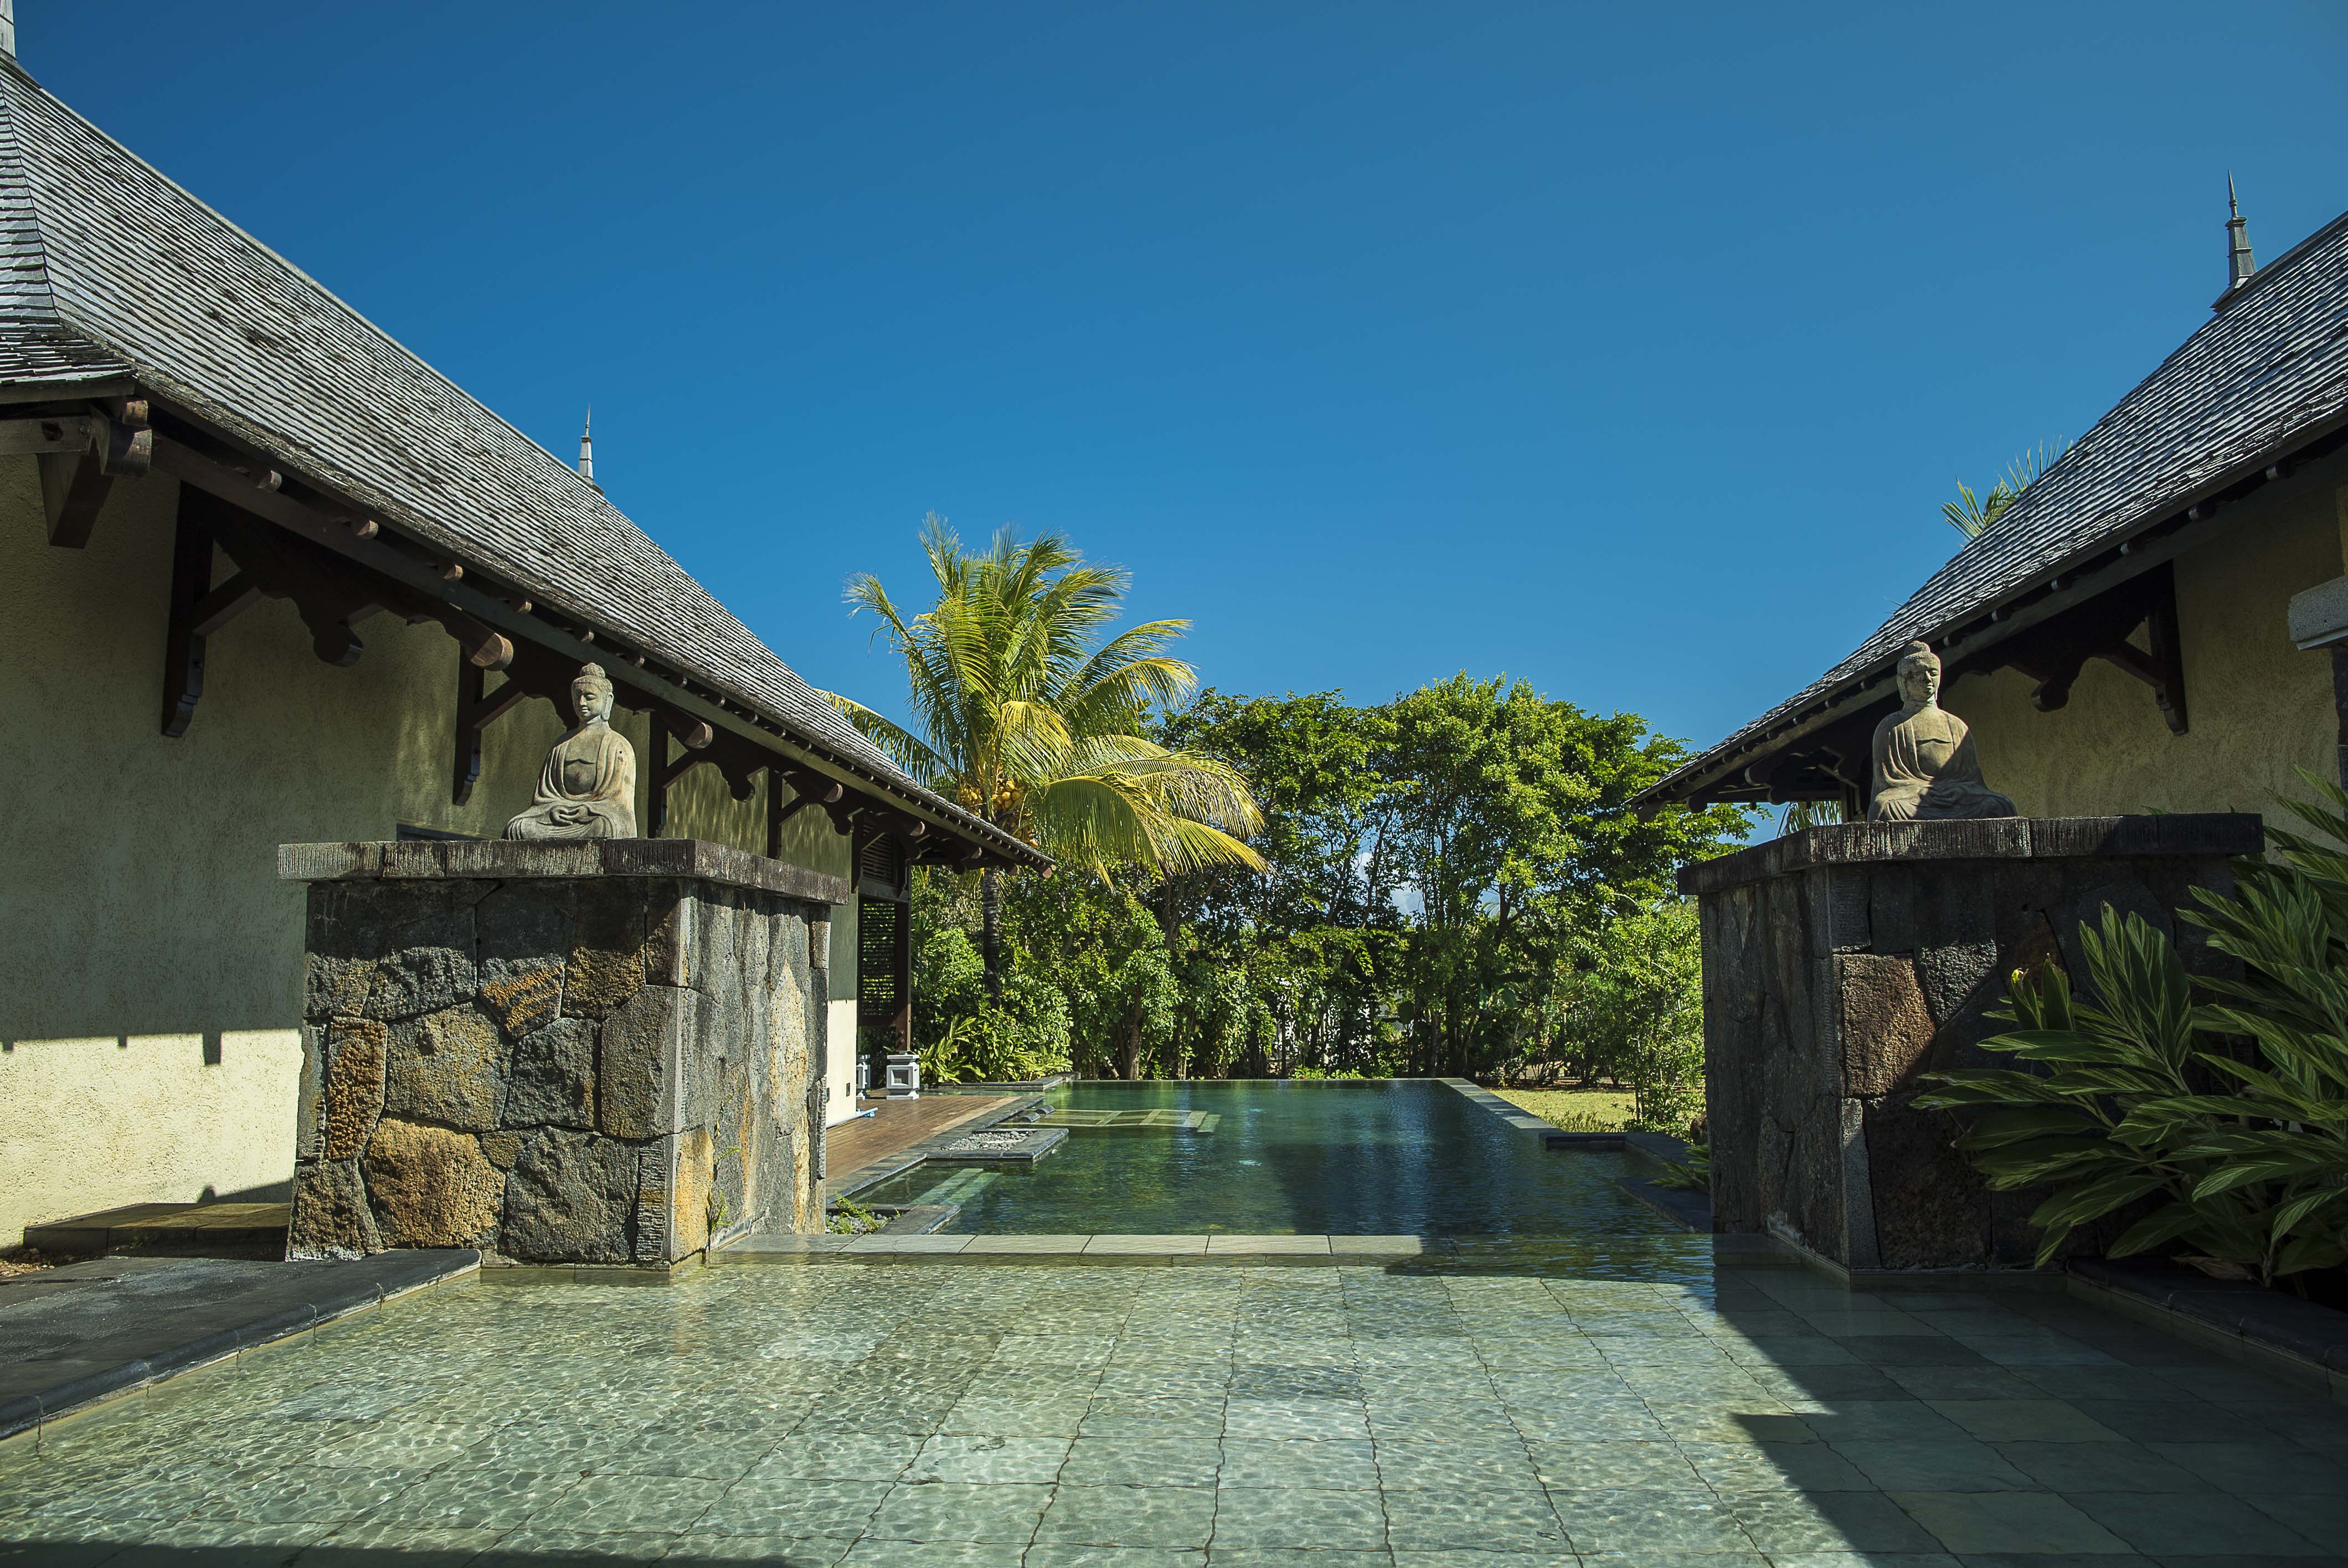 Location villa luxe ile maurice entre golf et lagon sur la cote sud for Location luxe